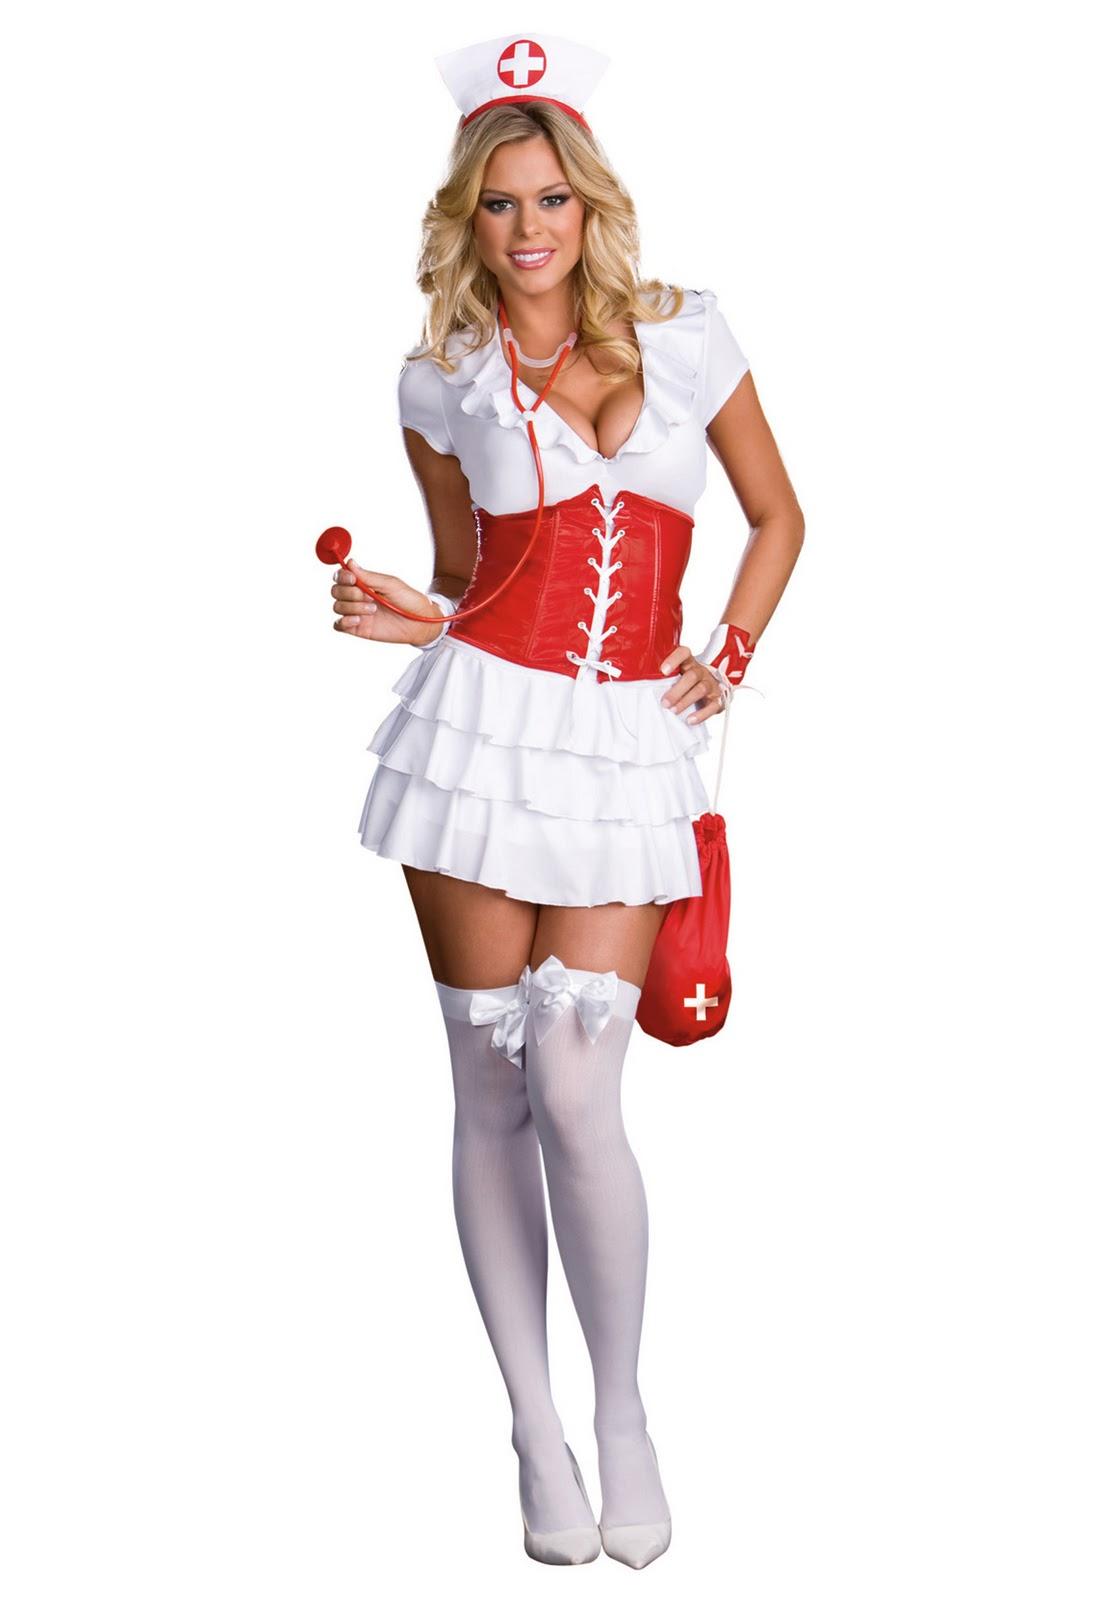 Hot_Nurse_17.jpg